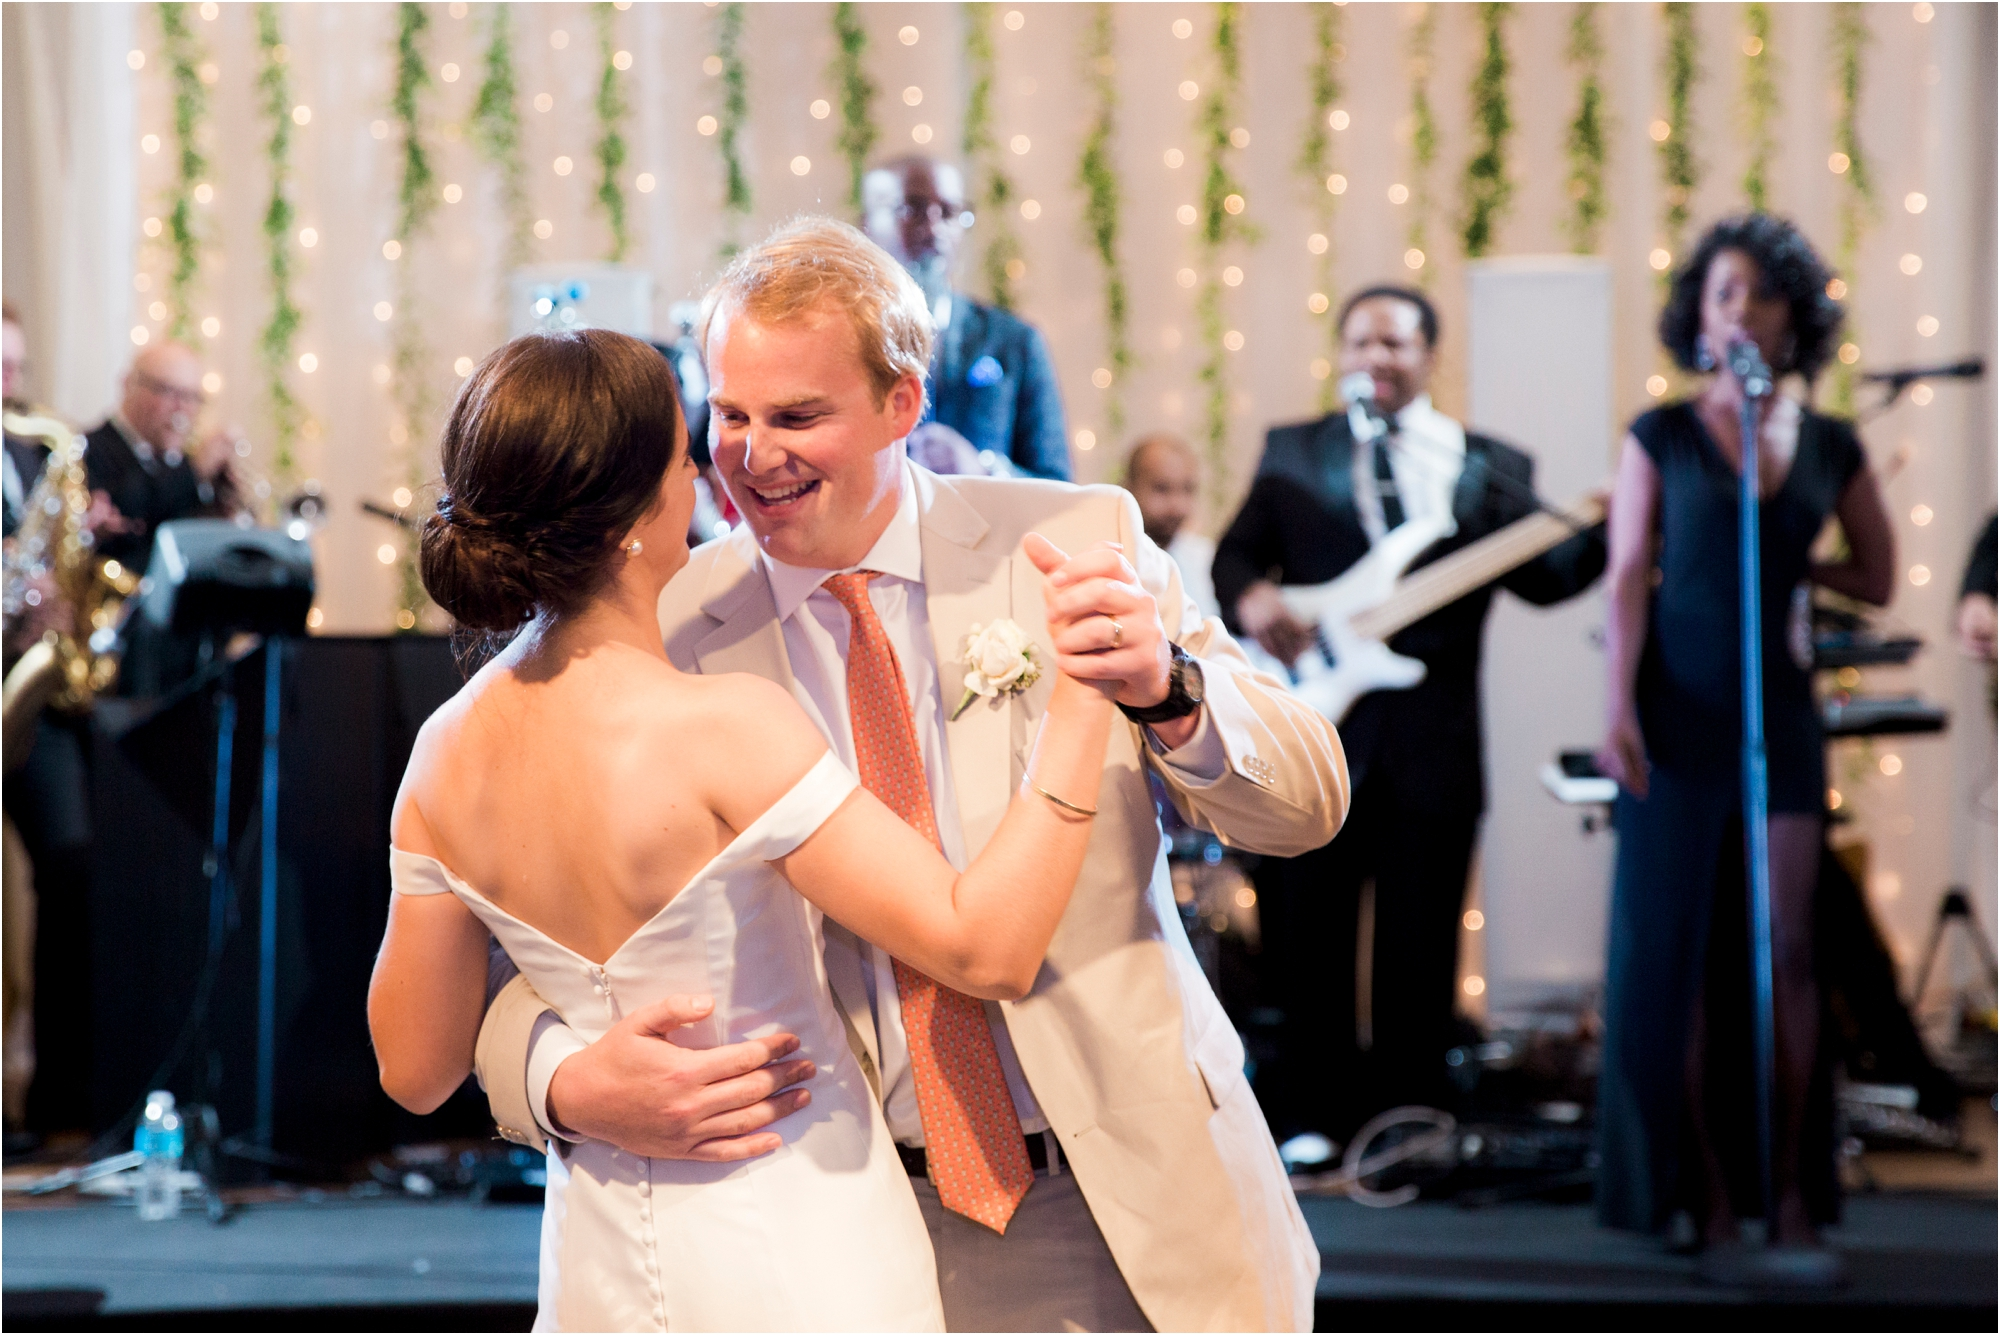 claire-thomas-farmington-country-club-charlottesville-virginia-wedding-photos_0039.jpg